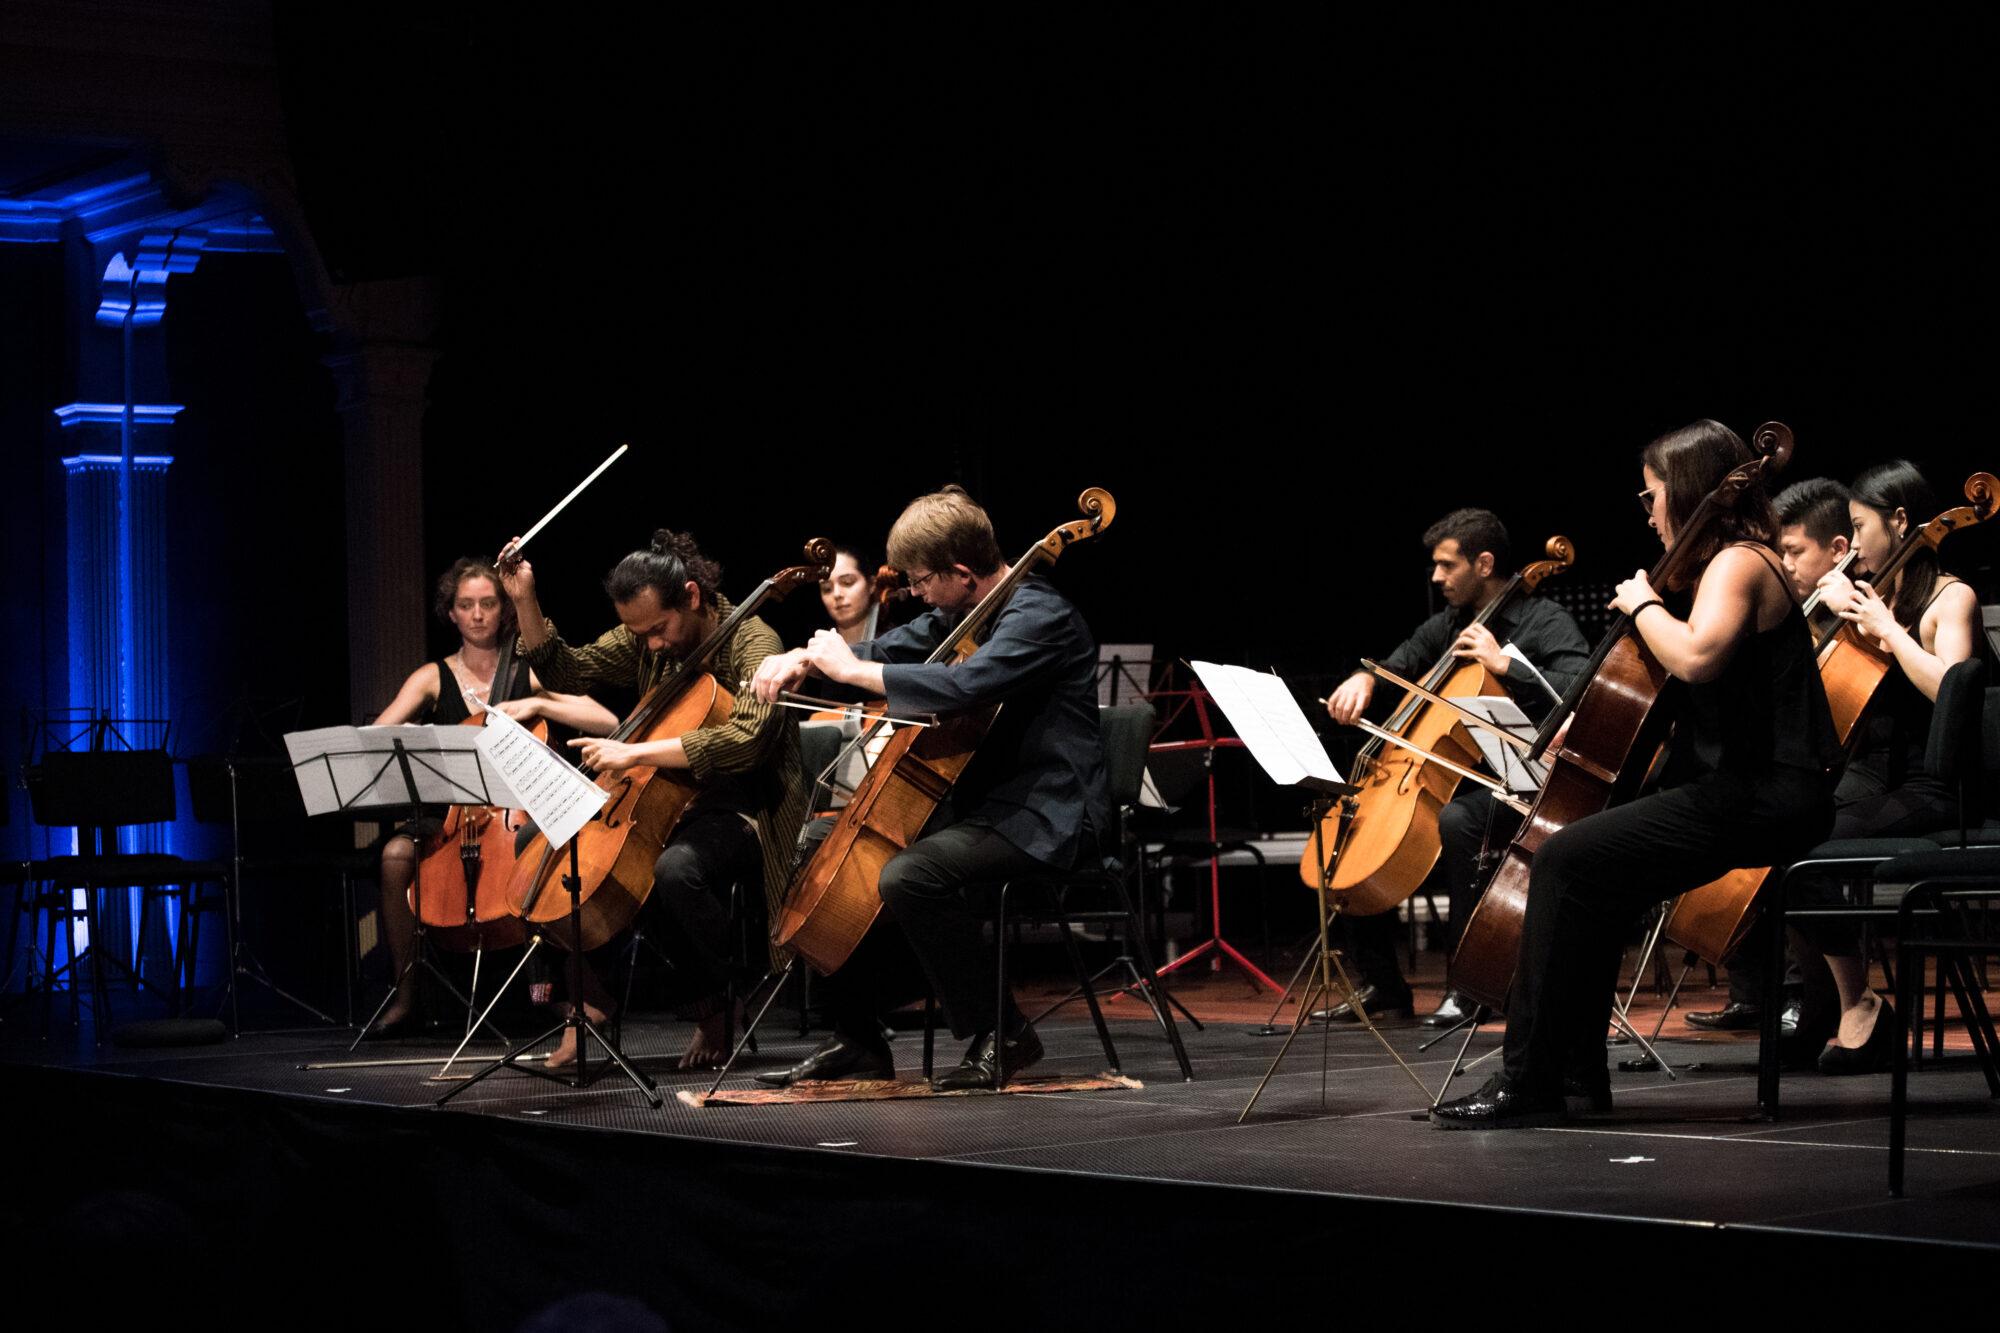 Verrassend en veelbelovend thema Cellofestival